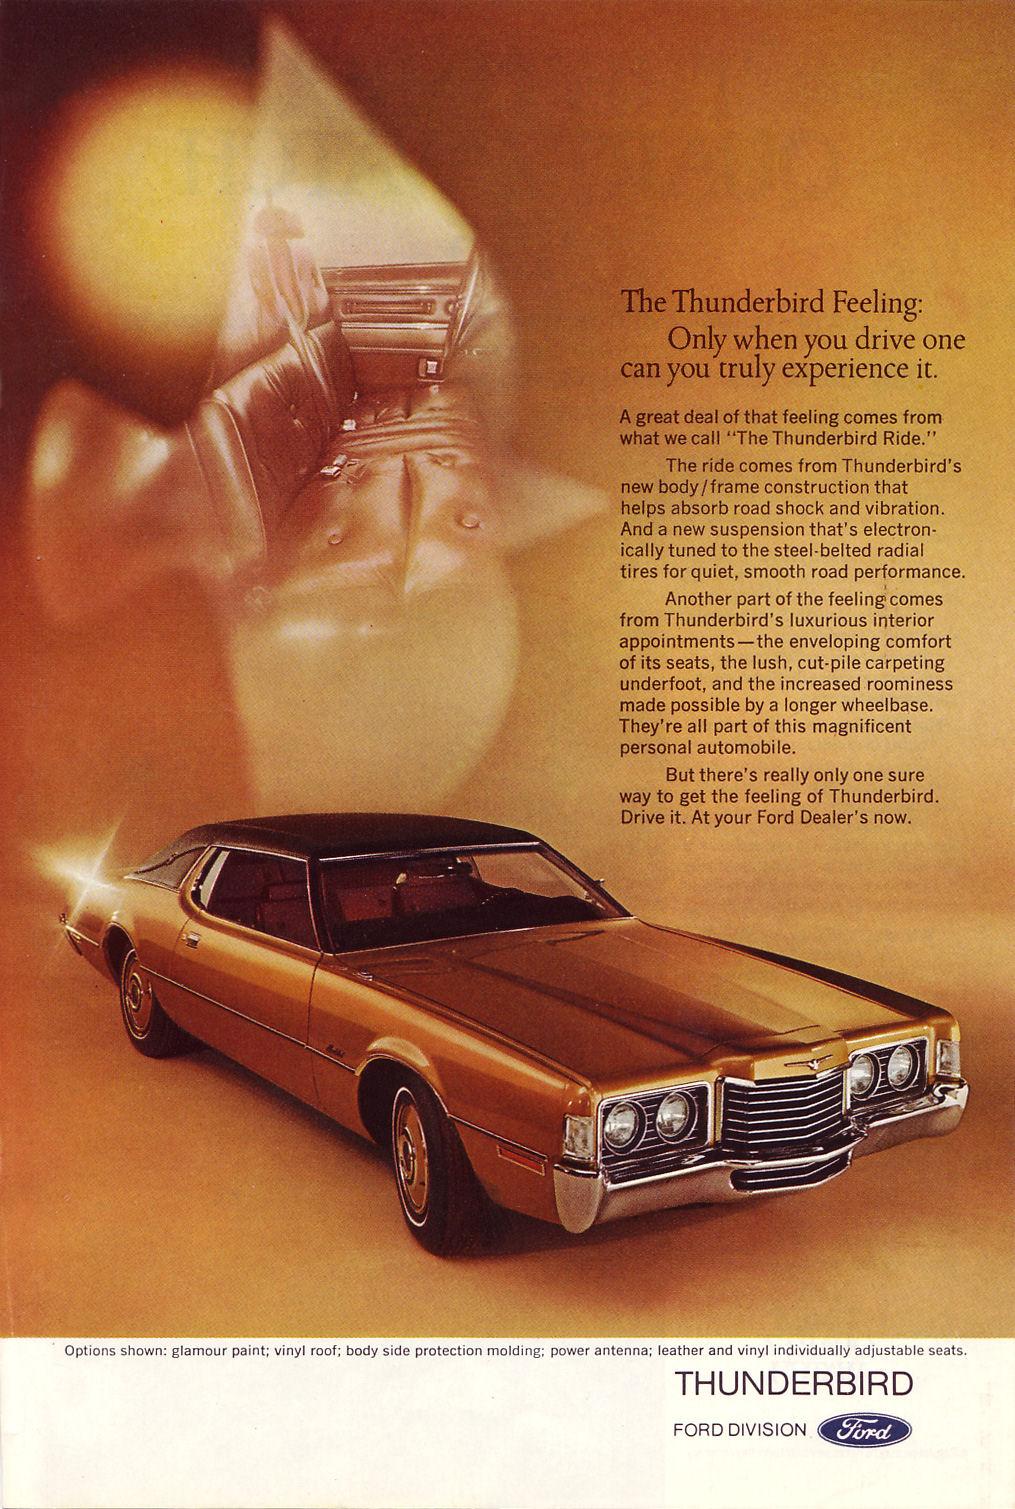 1972 Ford Thunderbird Ad 02